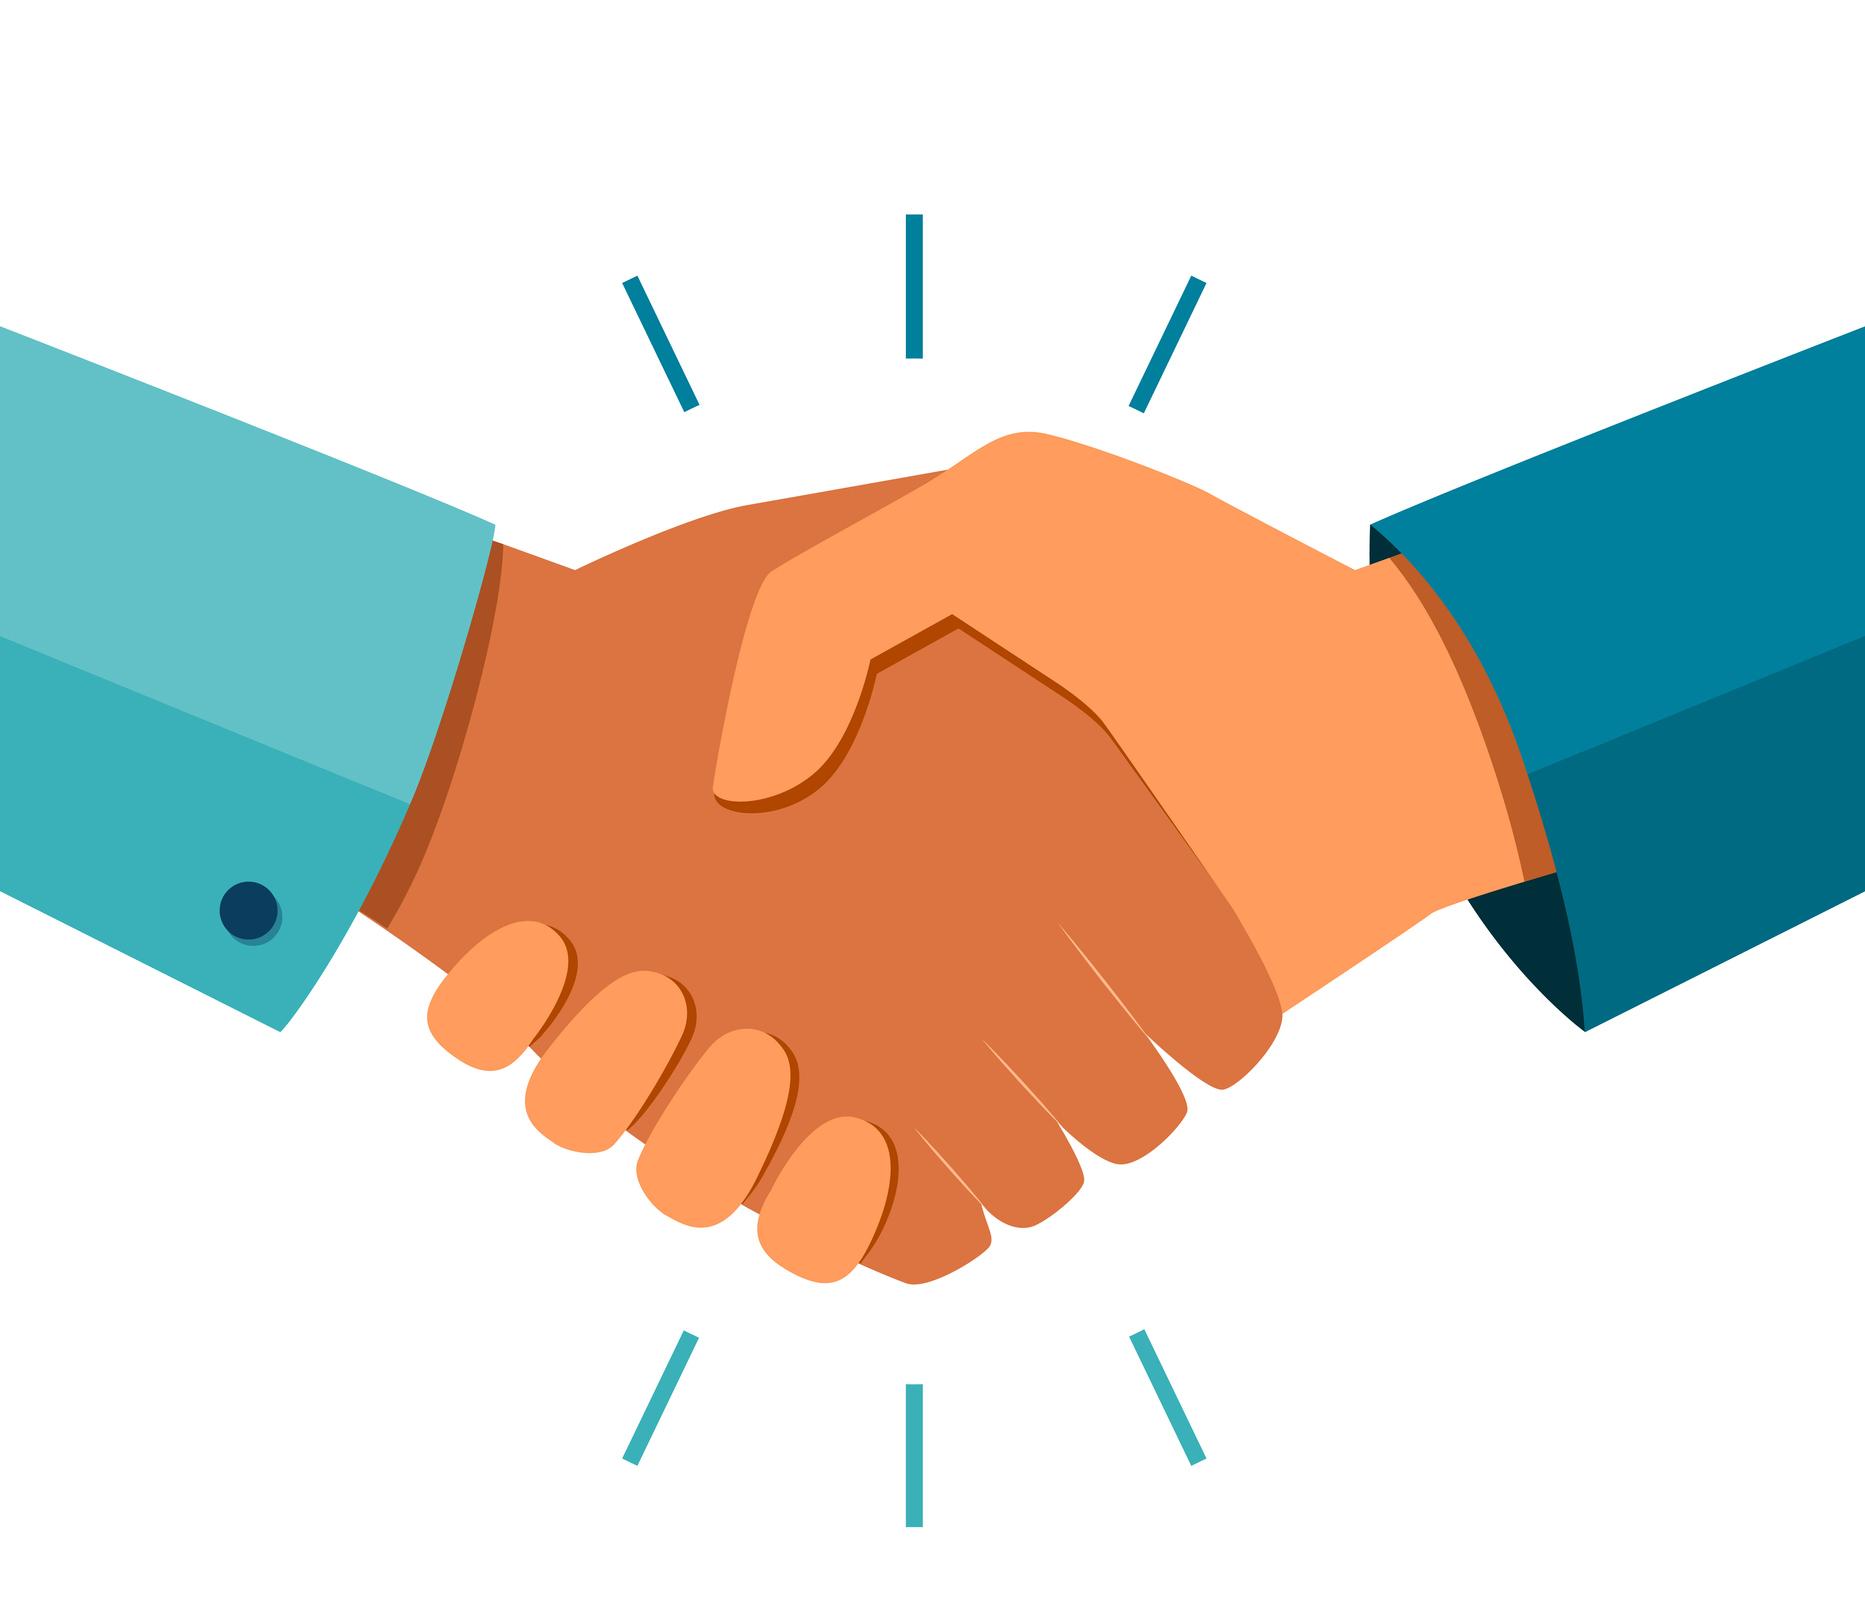 Handshake of business partners. Business handshake. Successful deal. Vector flat style illustration